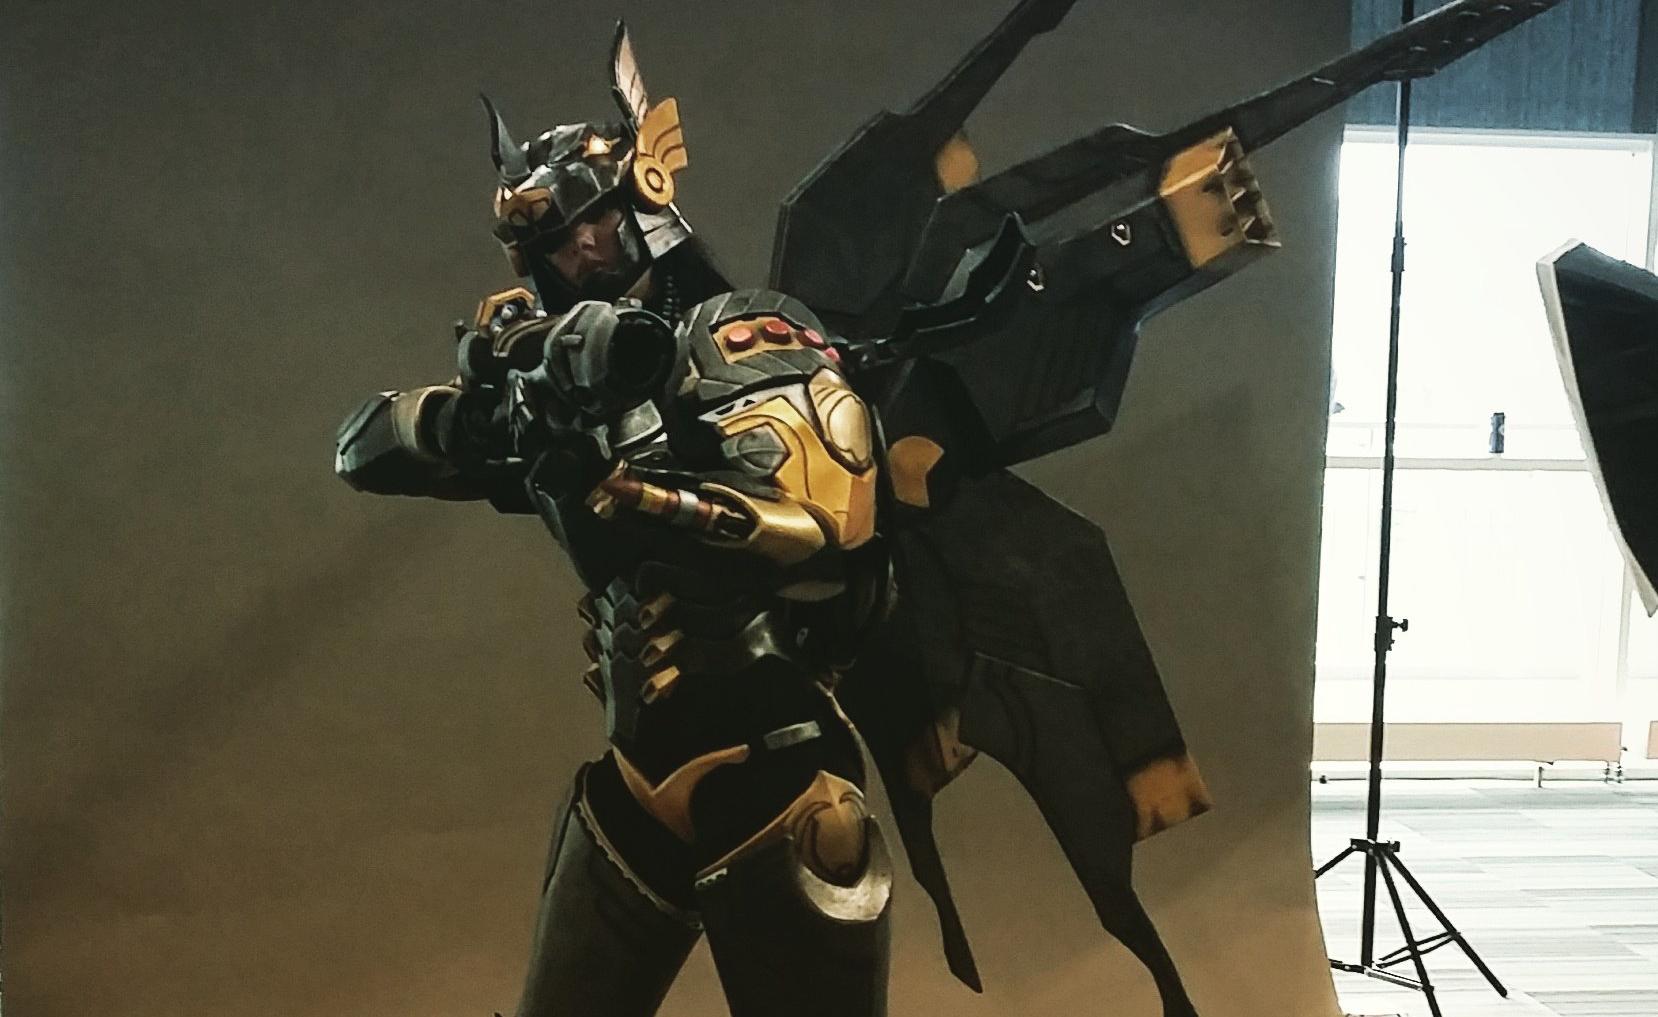 cosplay overwatch pharah